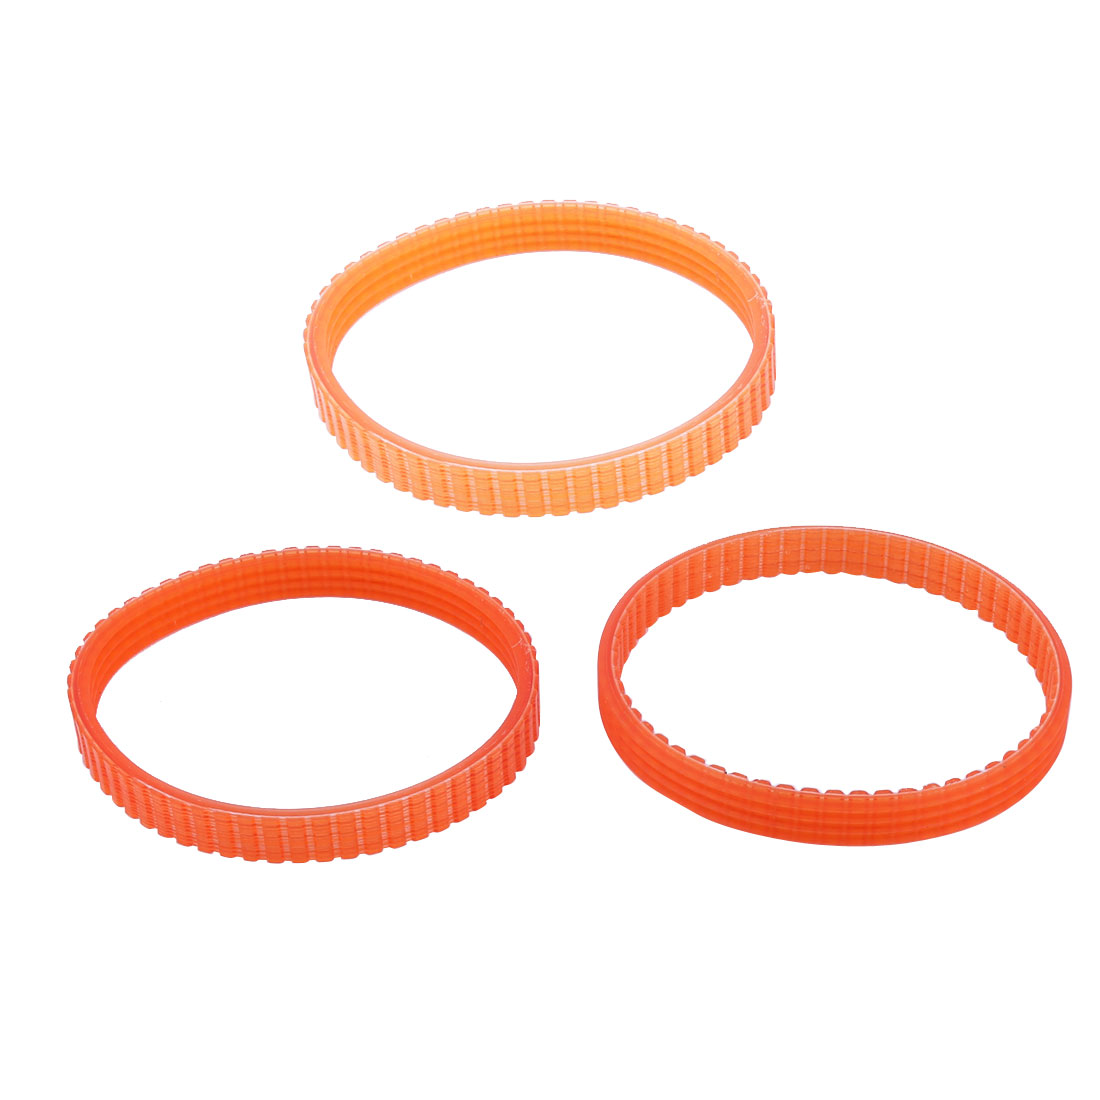 Industrial Rubber 1900B Speedometer Standard Timing Belts Orange 23cm Long 3pcs